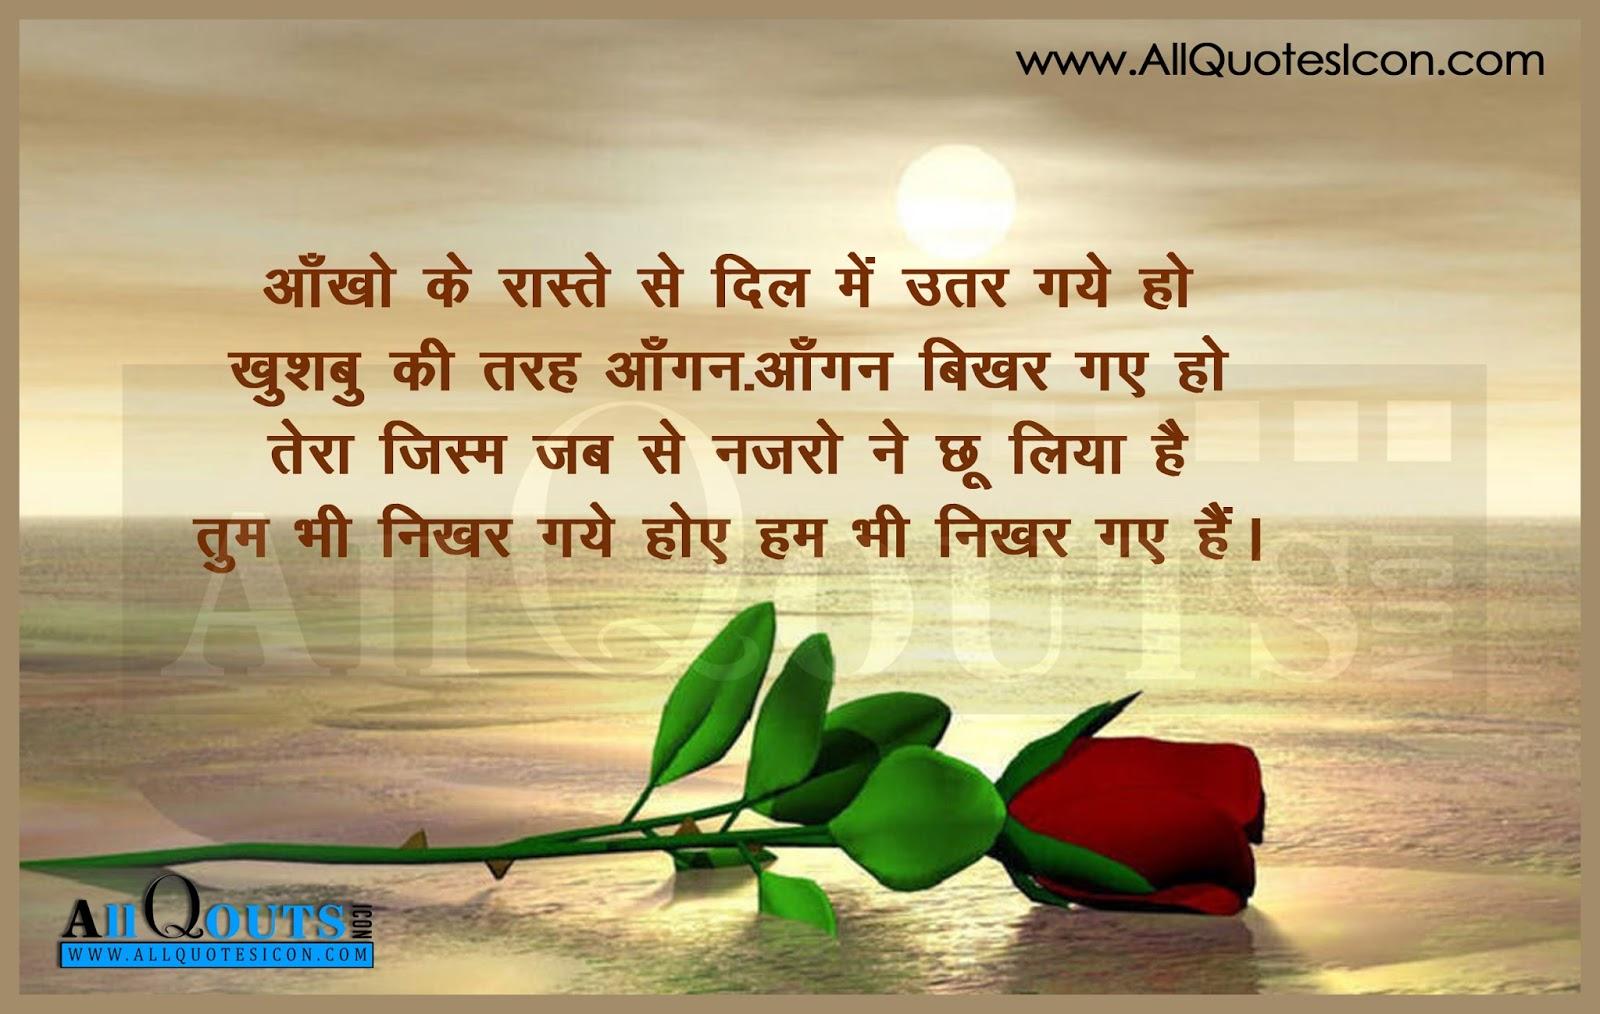 Love Shayari In Hindi Www Allquotesicon Com Telugu Quotes